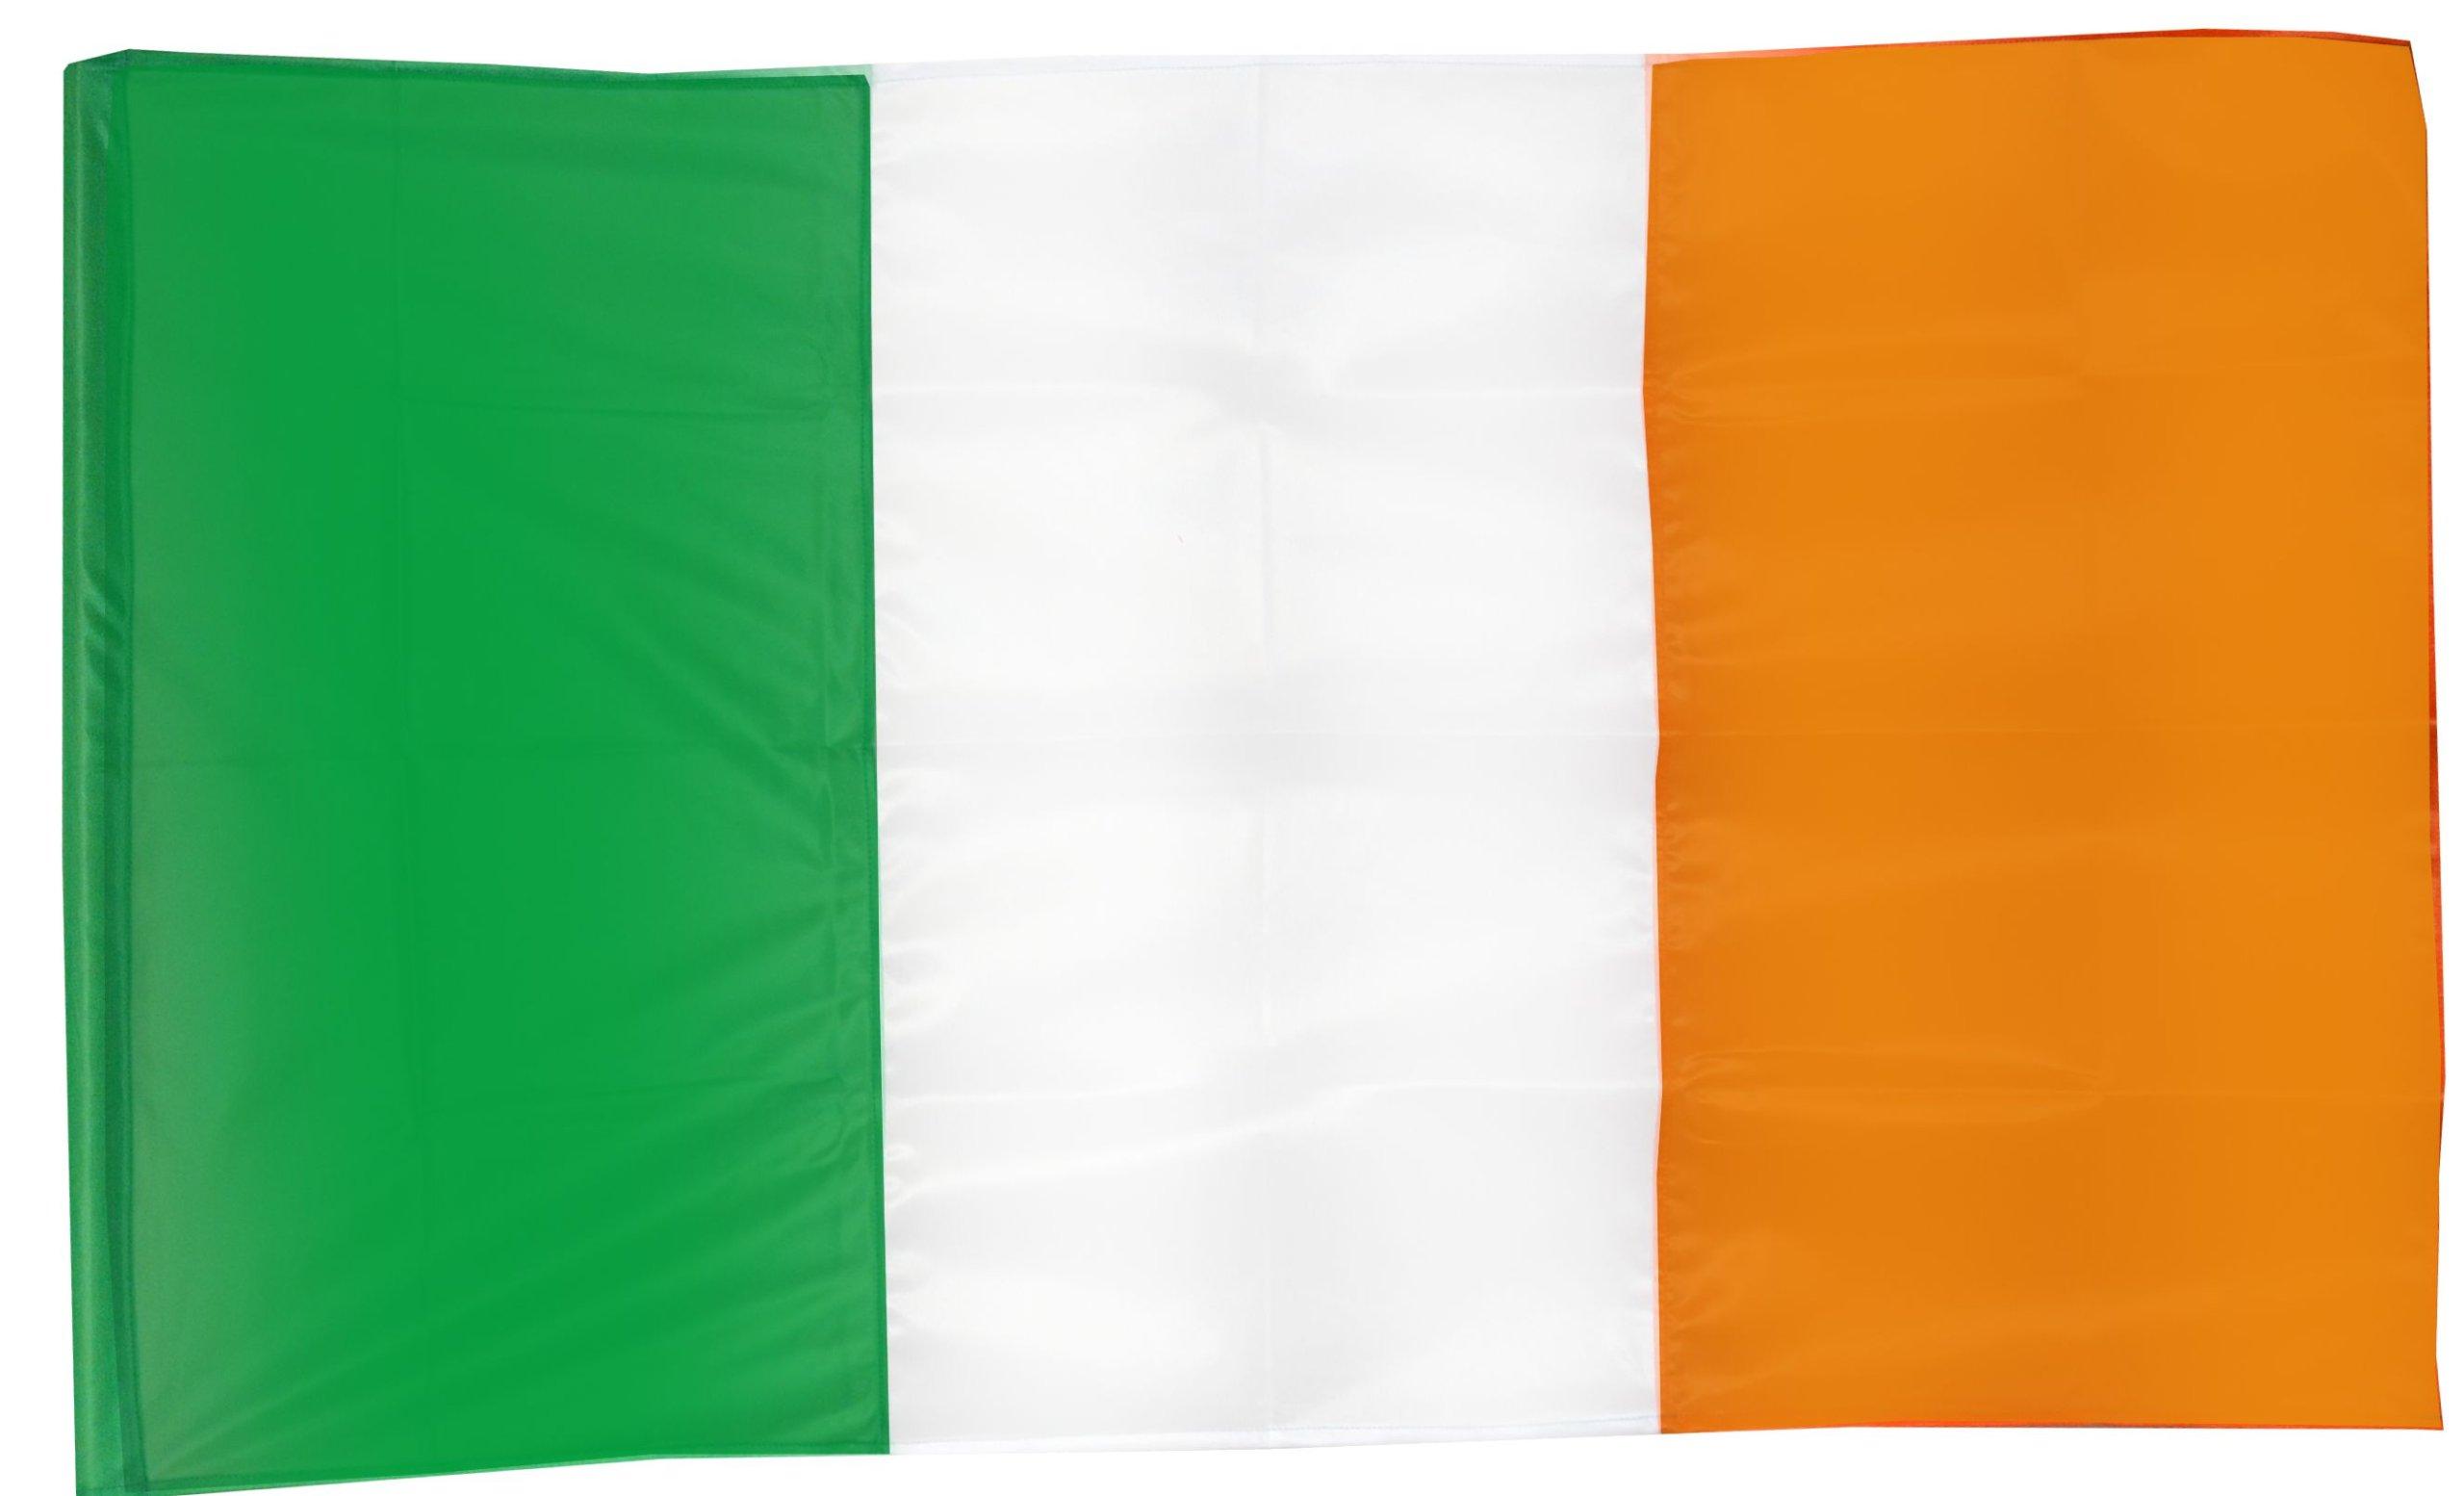 ирландский флаг картинки петра порошенко нашли